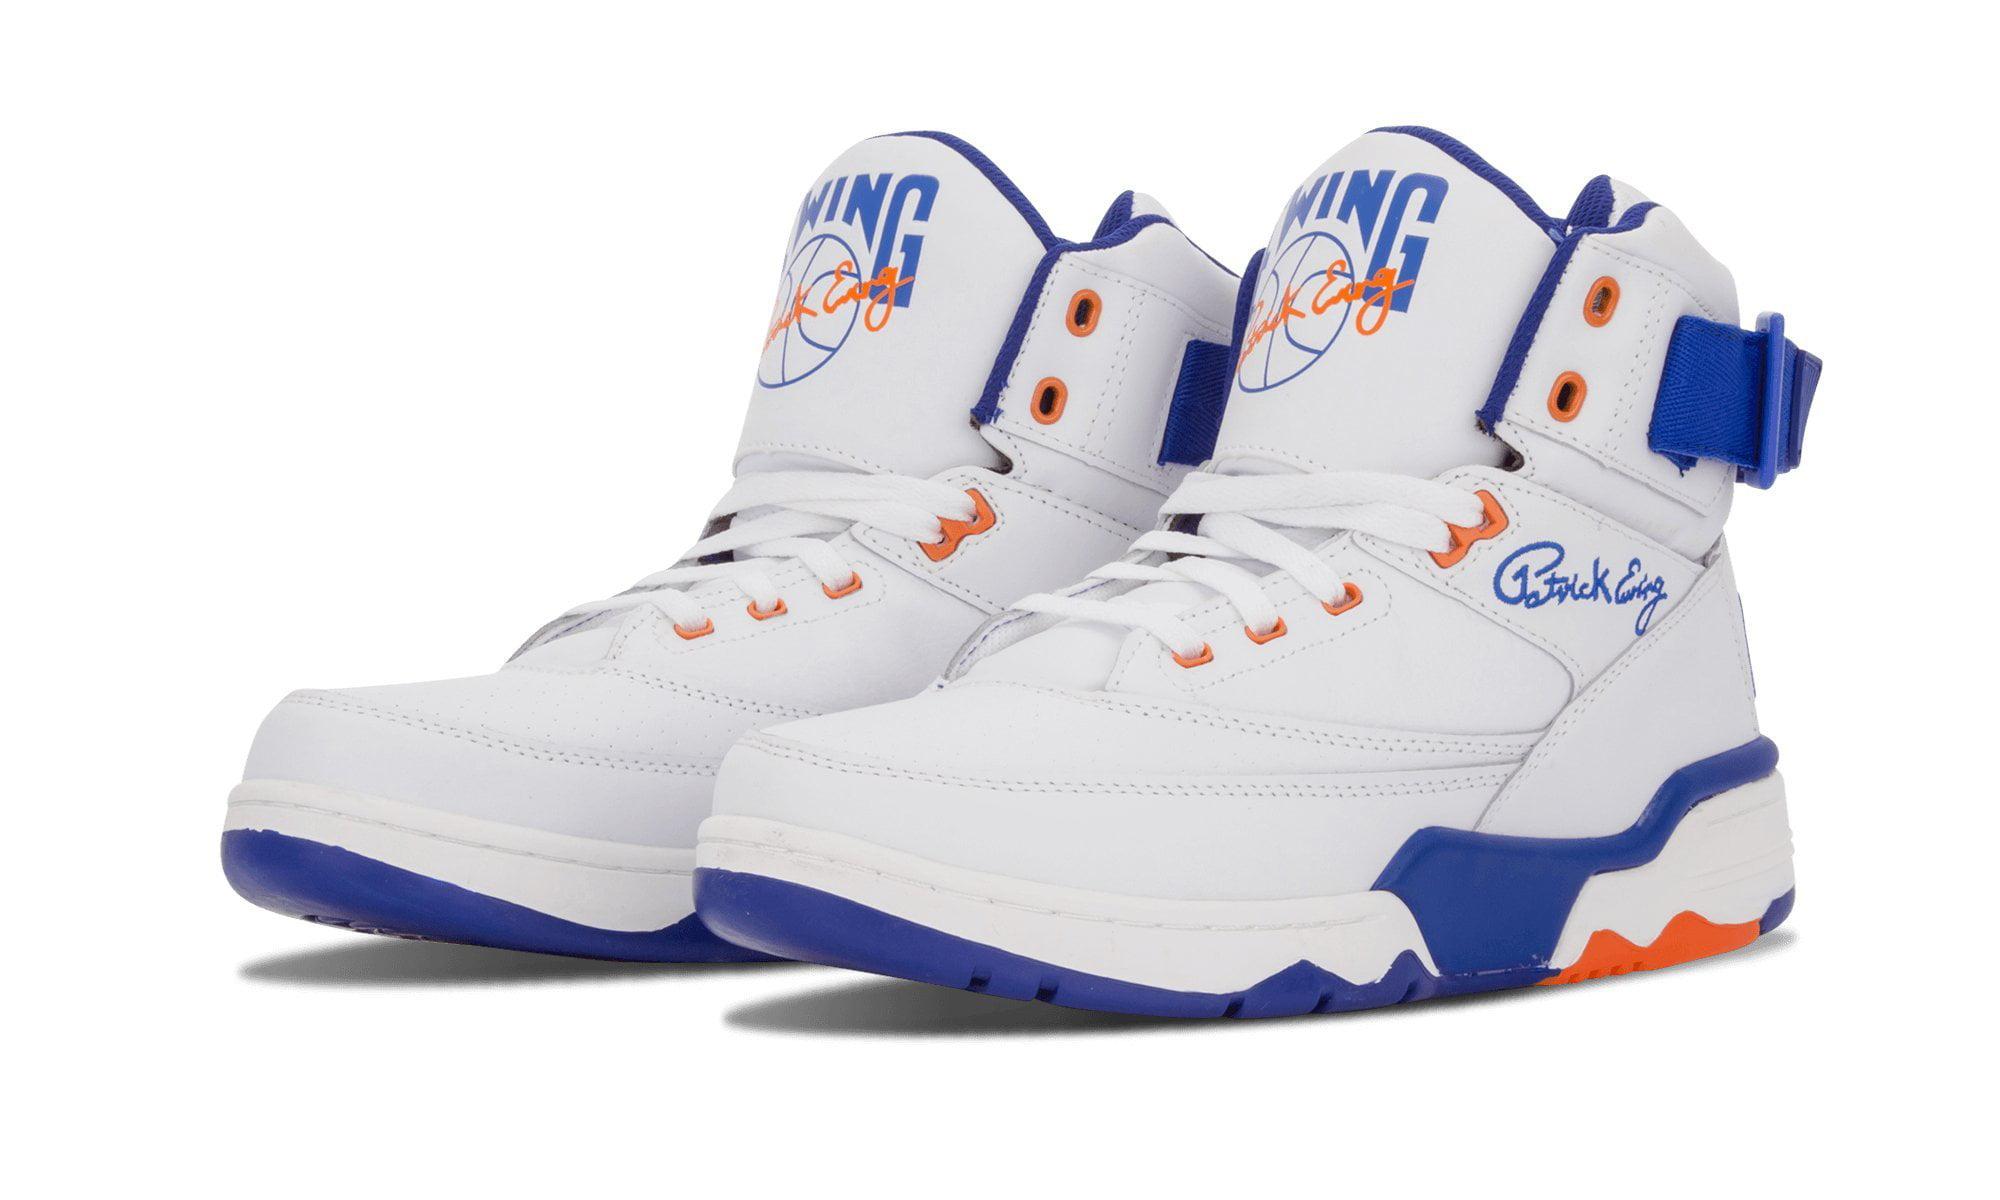 Ewing Athletics Ewing 33 Hi Knicks Men's Basketball Shoes 1EW90014-136 Size 8